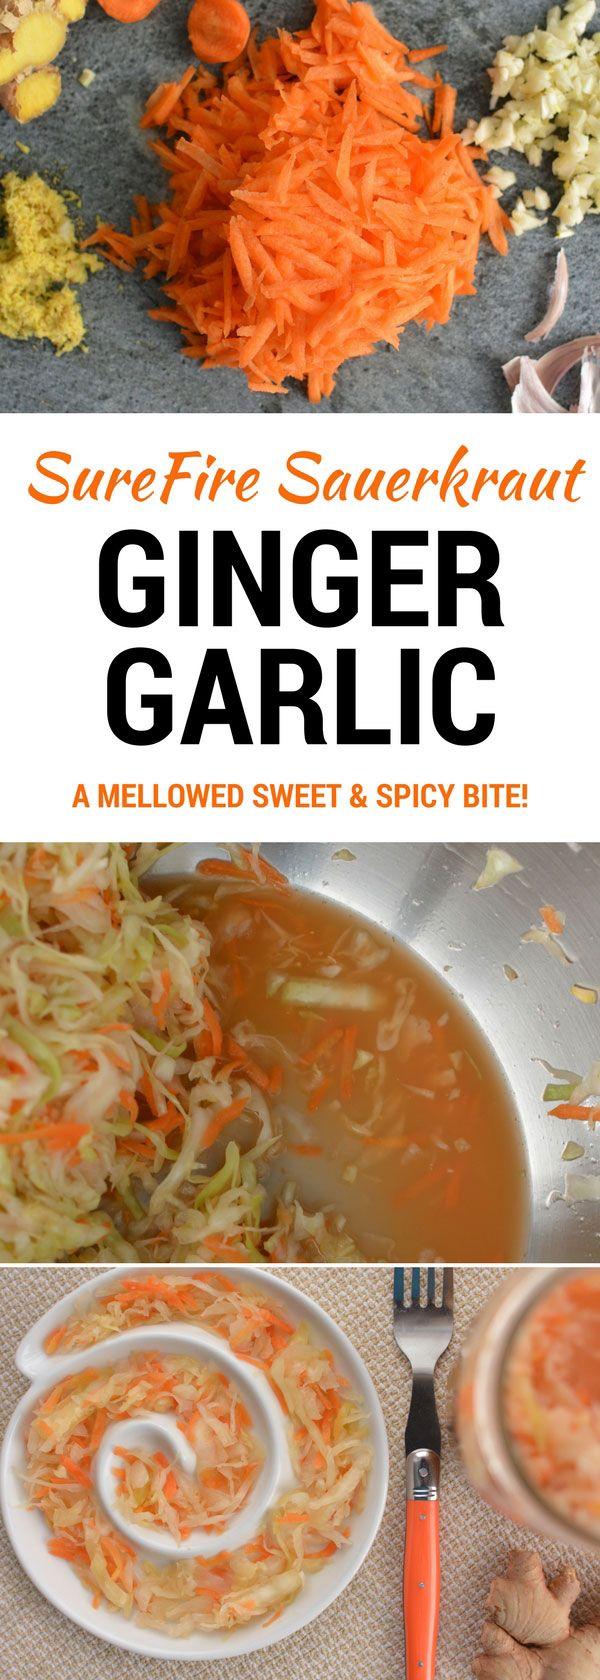 Ginger carrot sauerkraut recipe sauerkraut recipes sauerkraut preserving food forumfinder Gallery